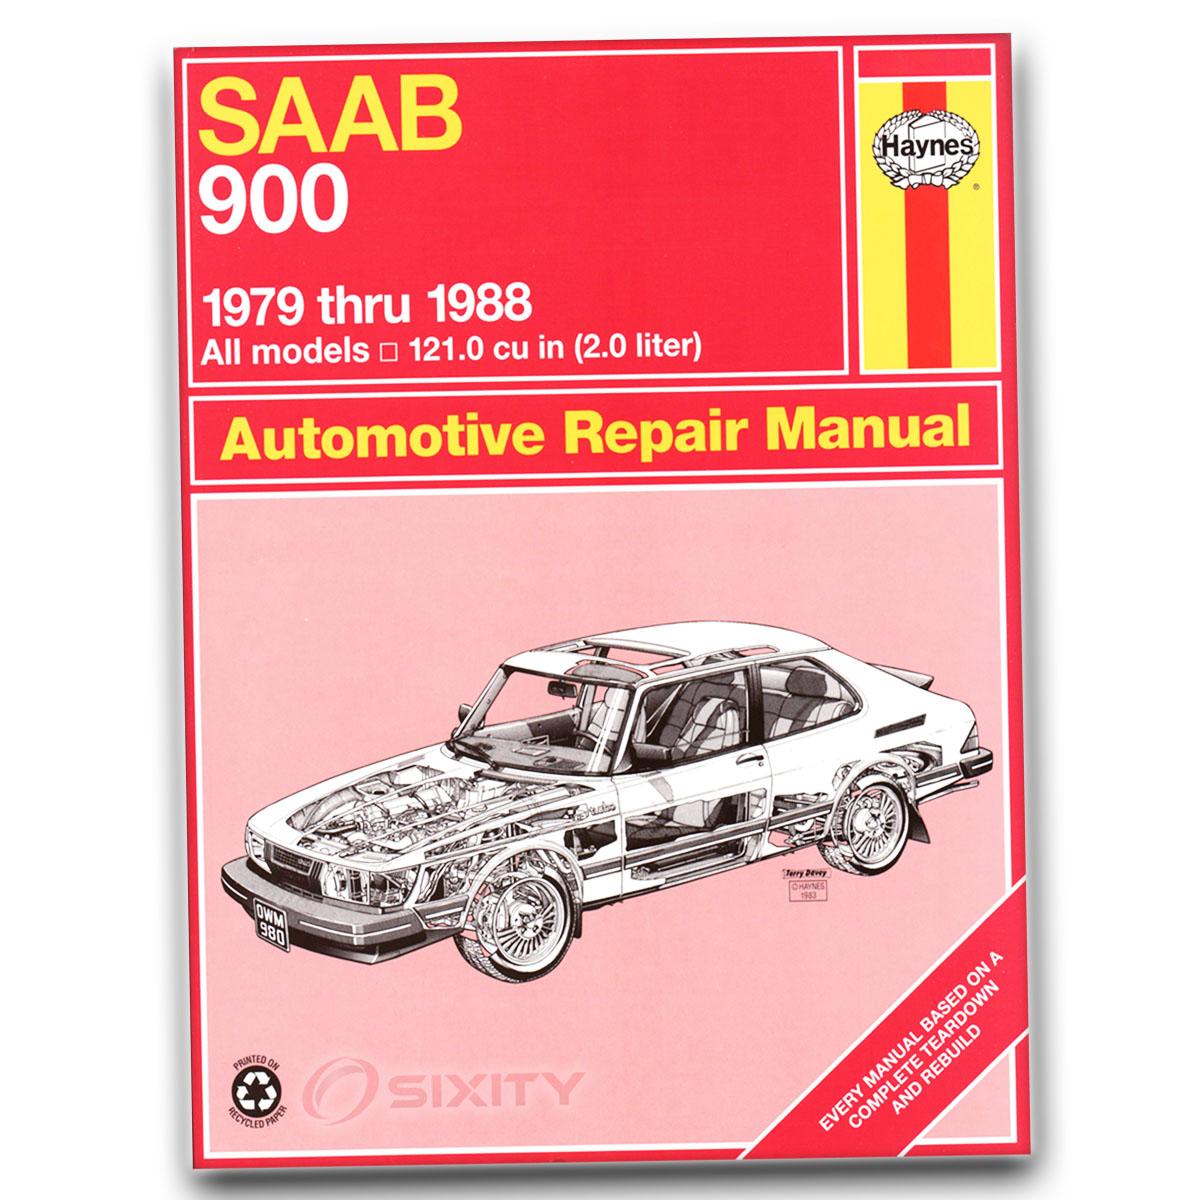 Haynes Repair Manual for Saab 900 EMS GLE Turbo Base GLI SPG Shop Service bh